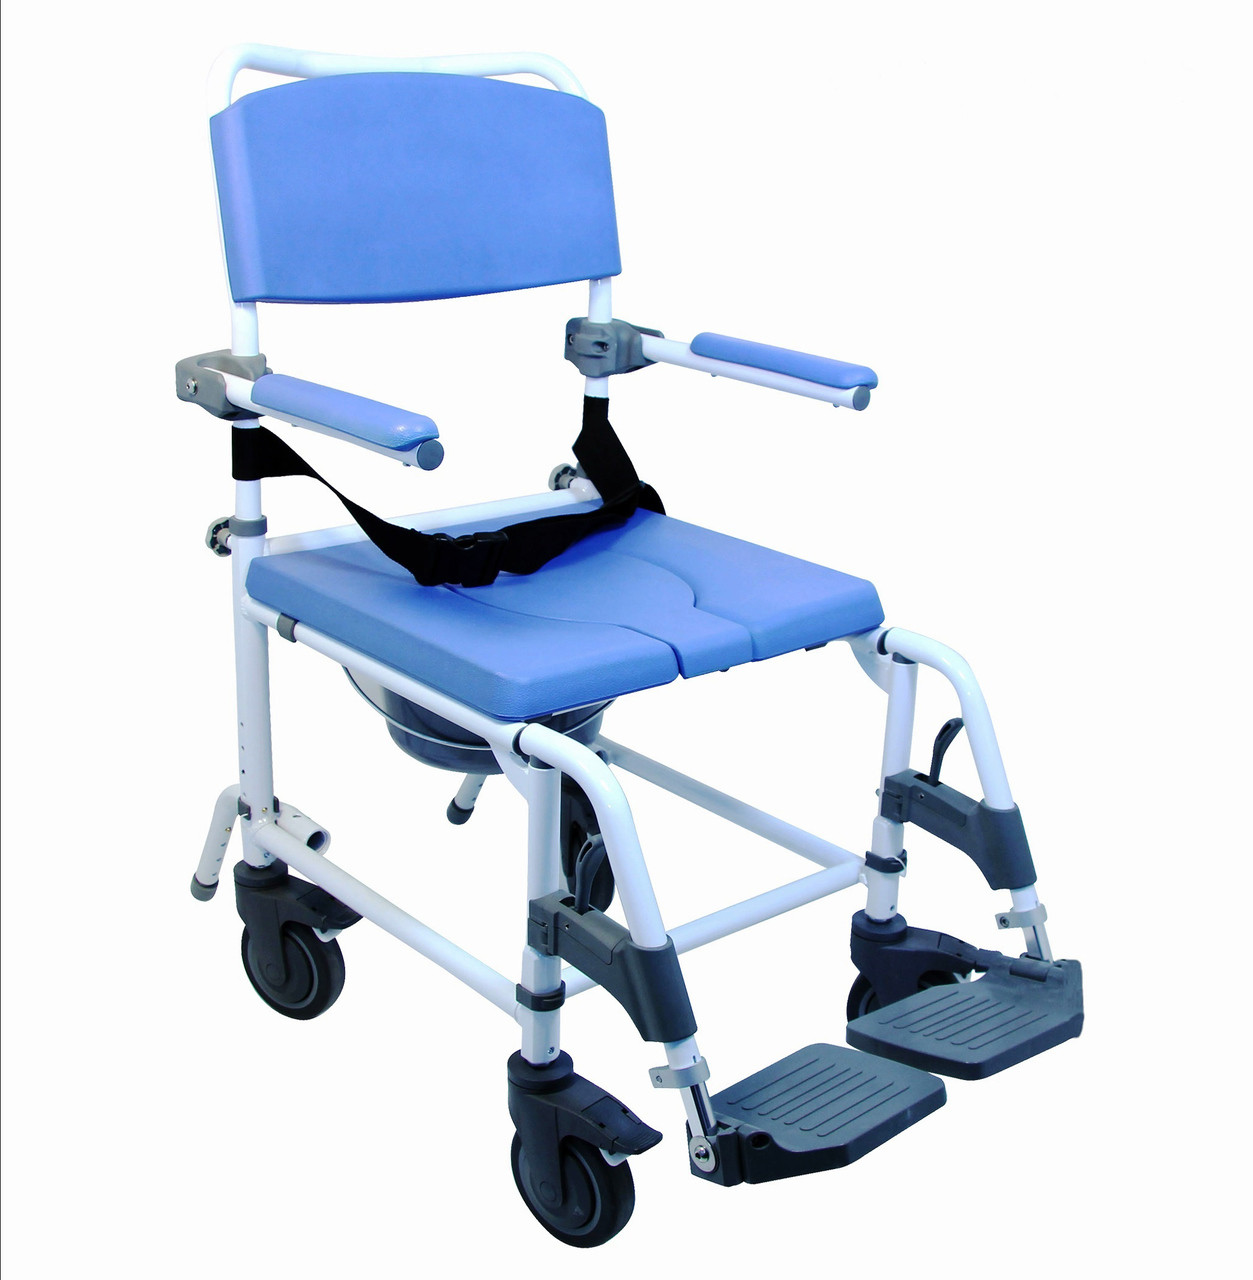 Best Basic Shower Commode Chair - CareProdx